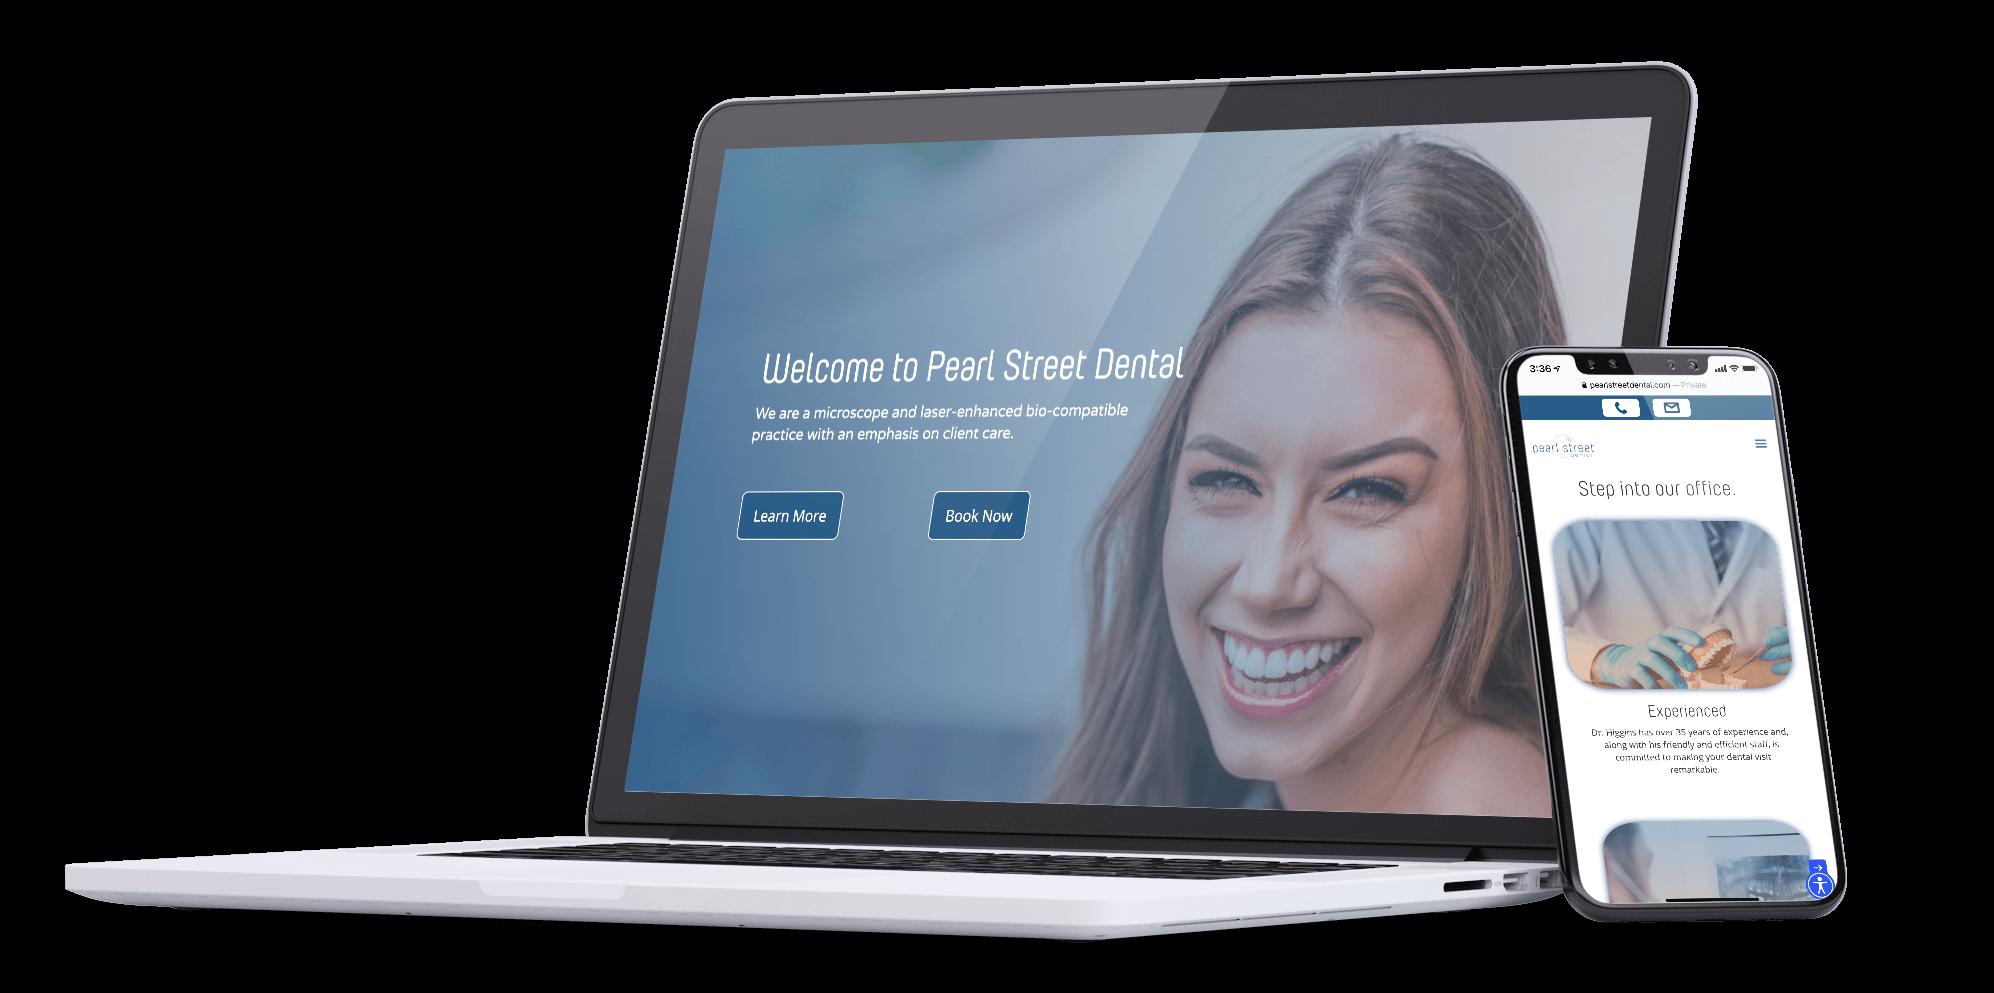 Pearl Street Dental